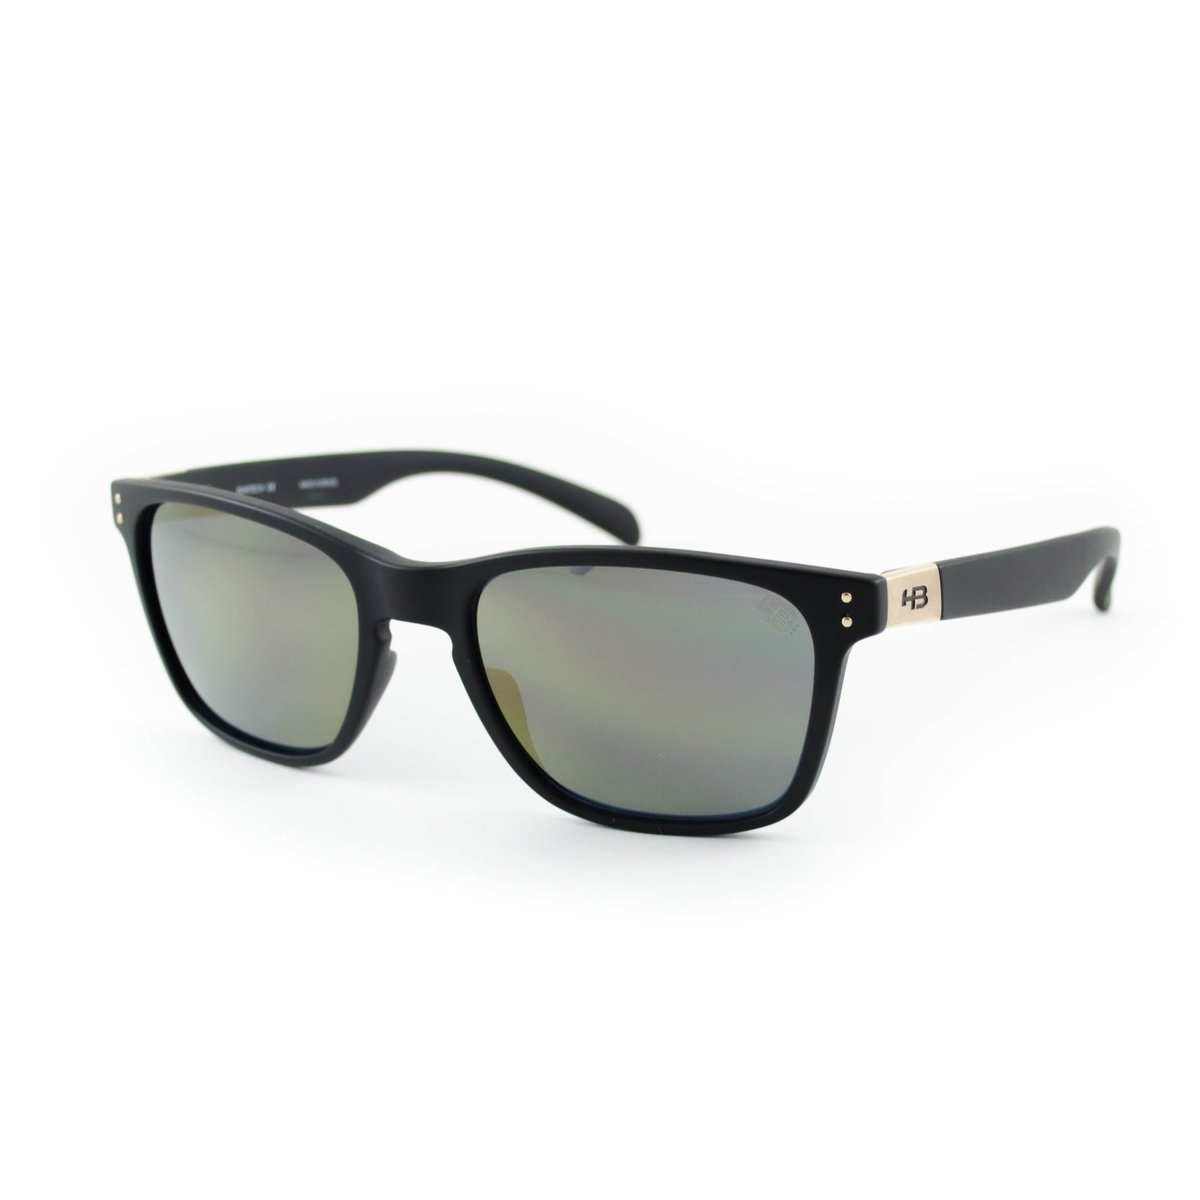 6ef537c7100fa Óculos de Sol HB Hot Buttered - Compre Agora   Netshoes